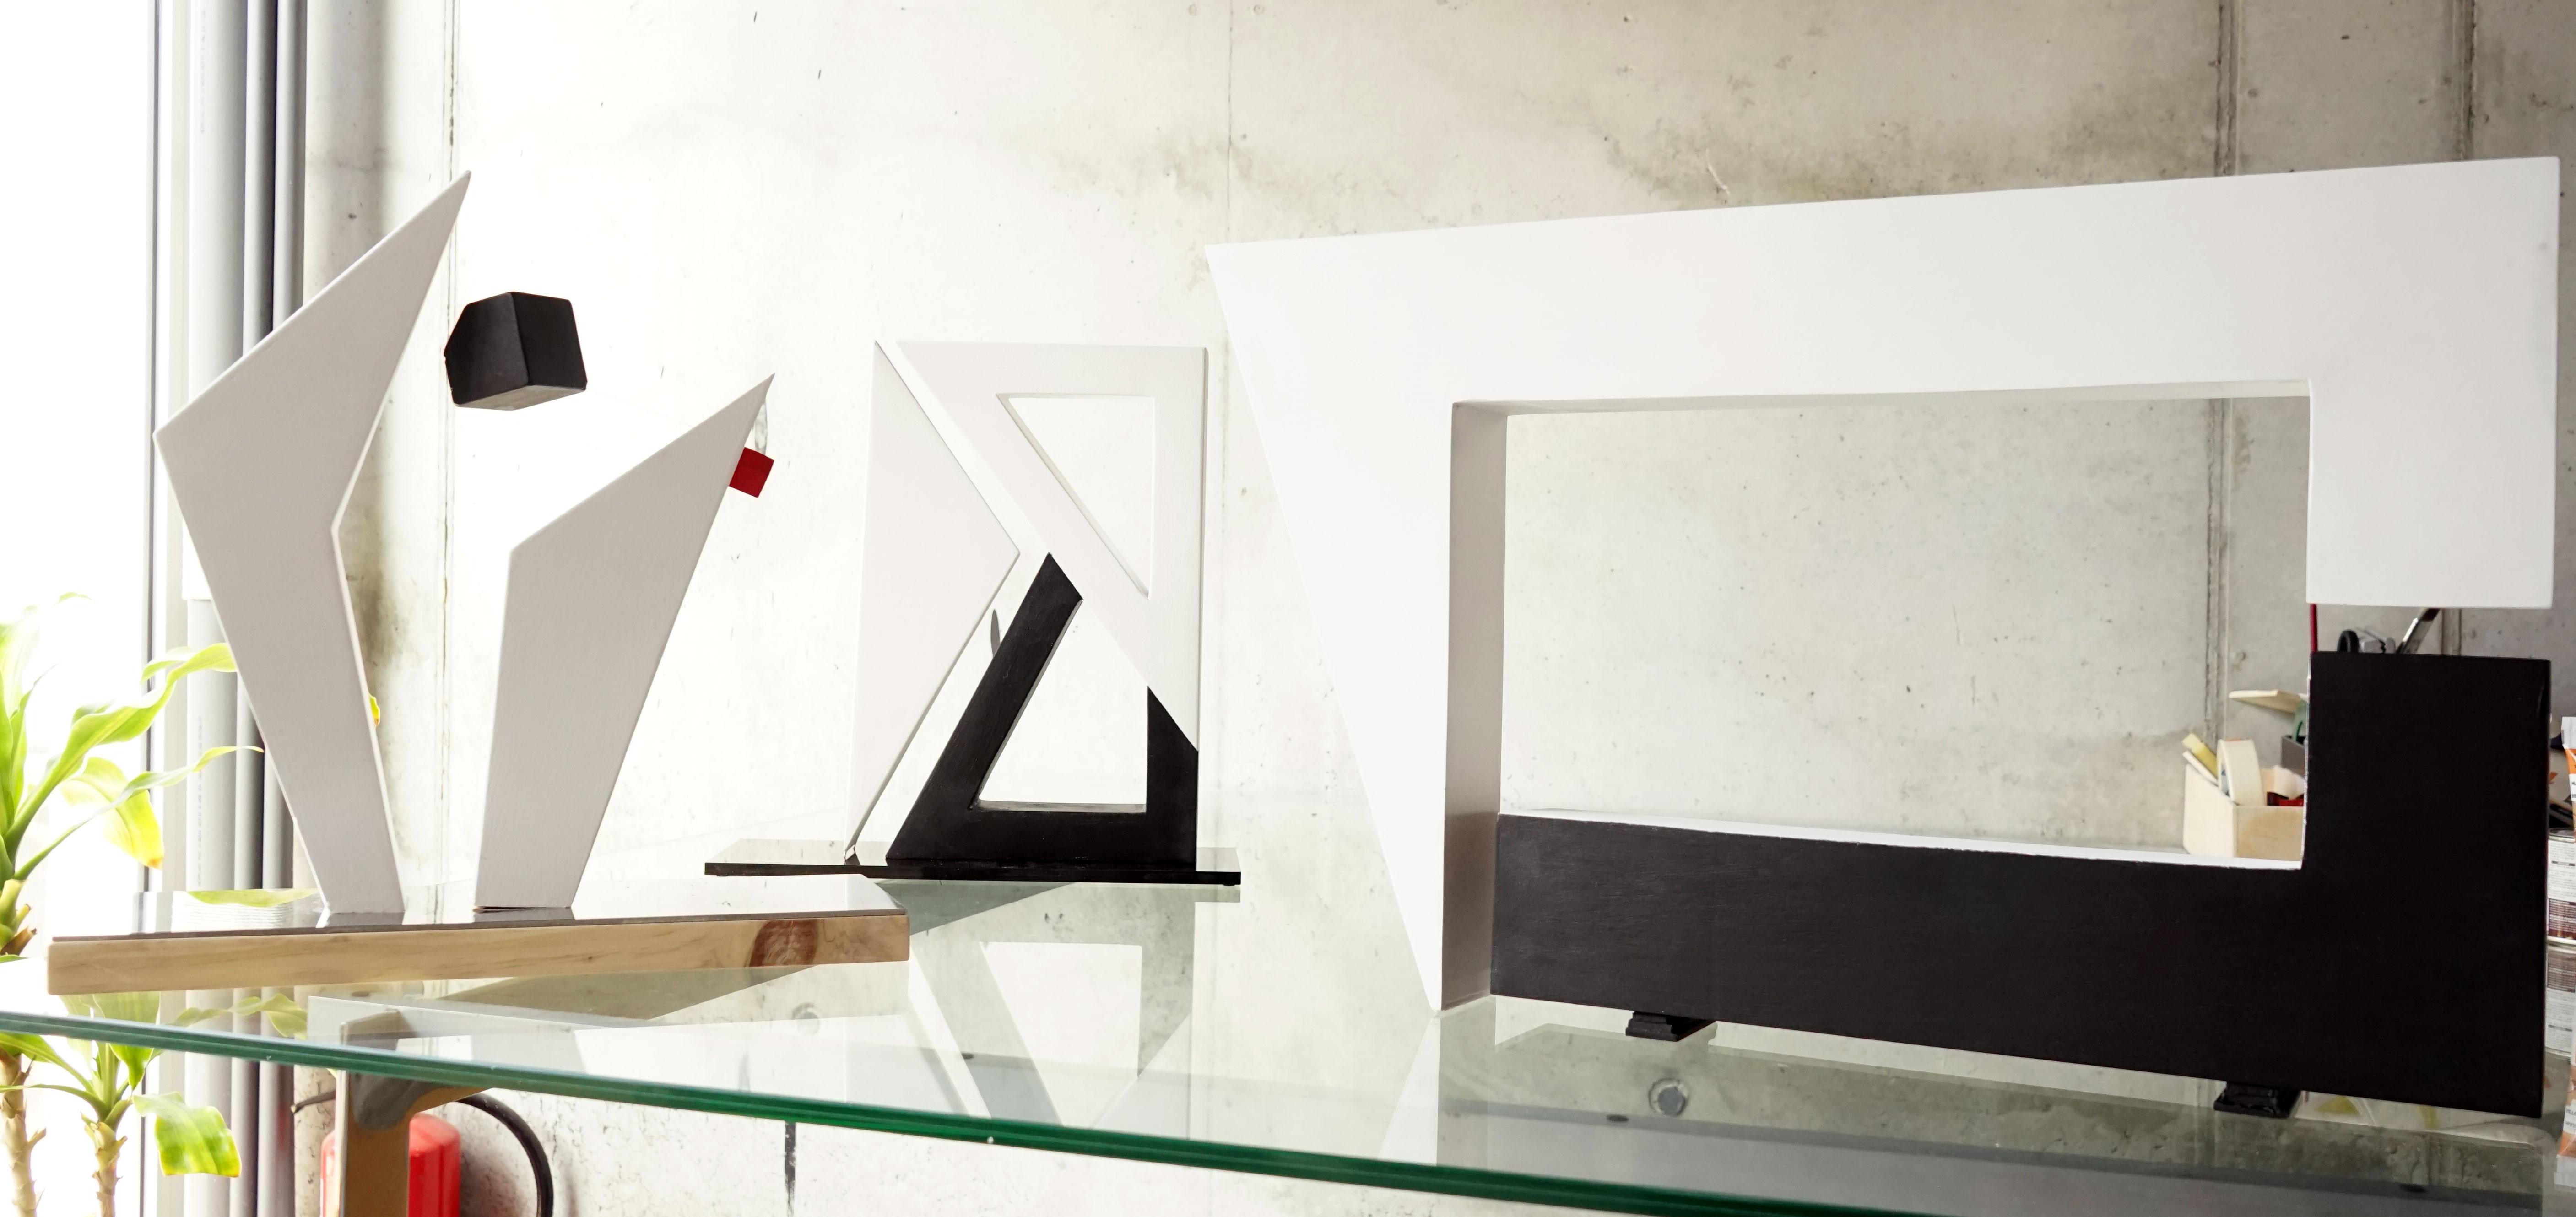 esculturas-magneticas-web